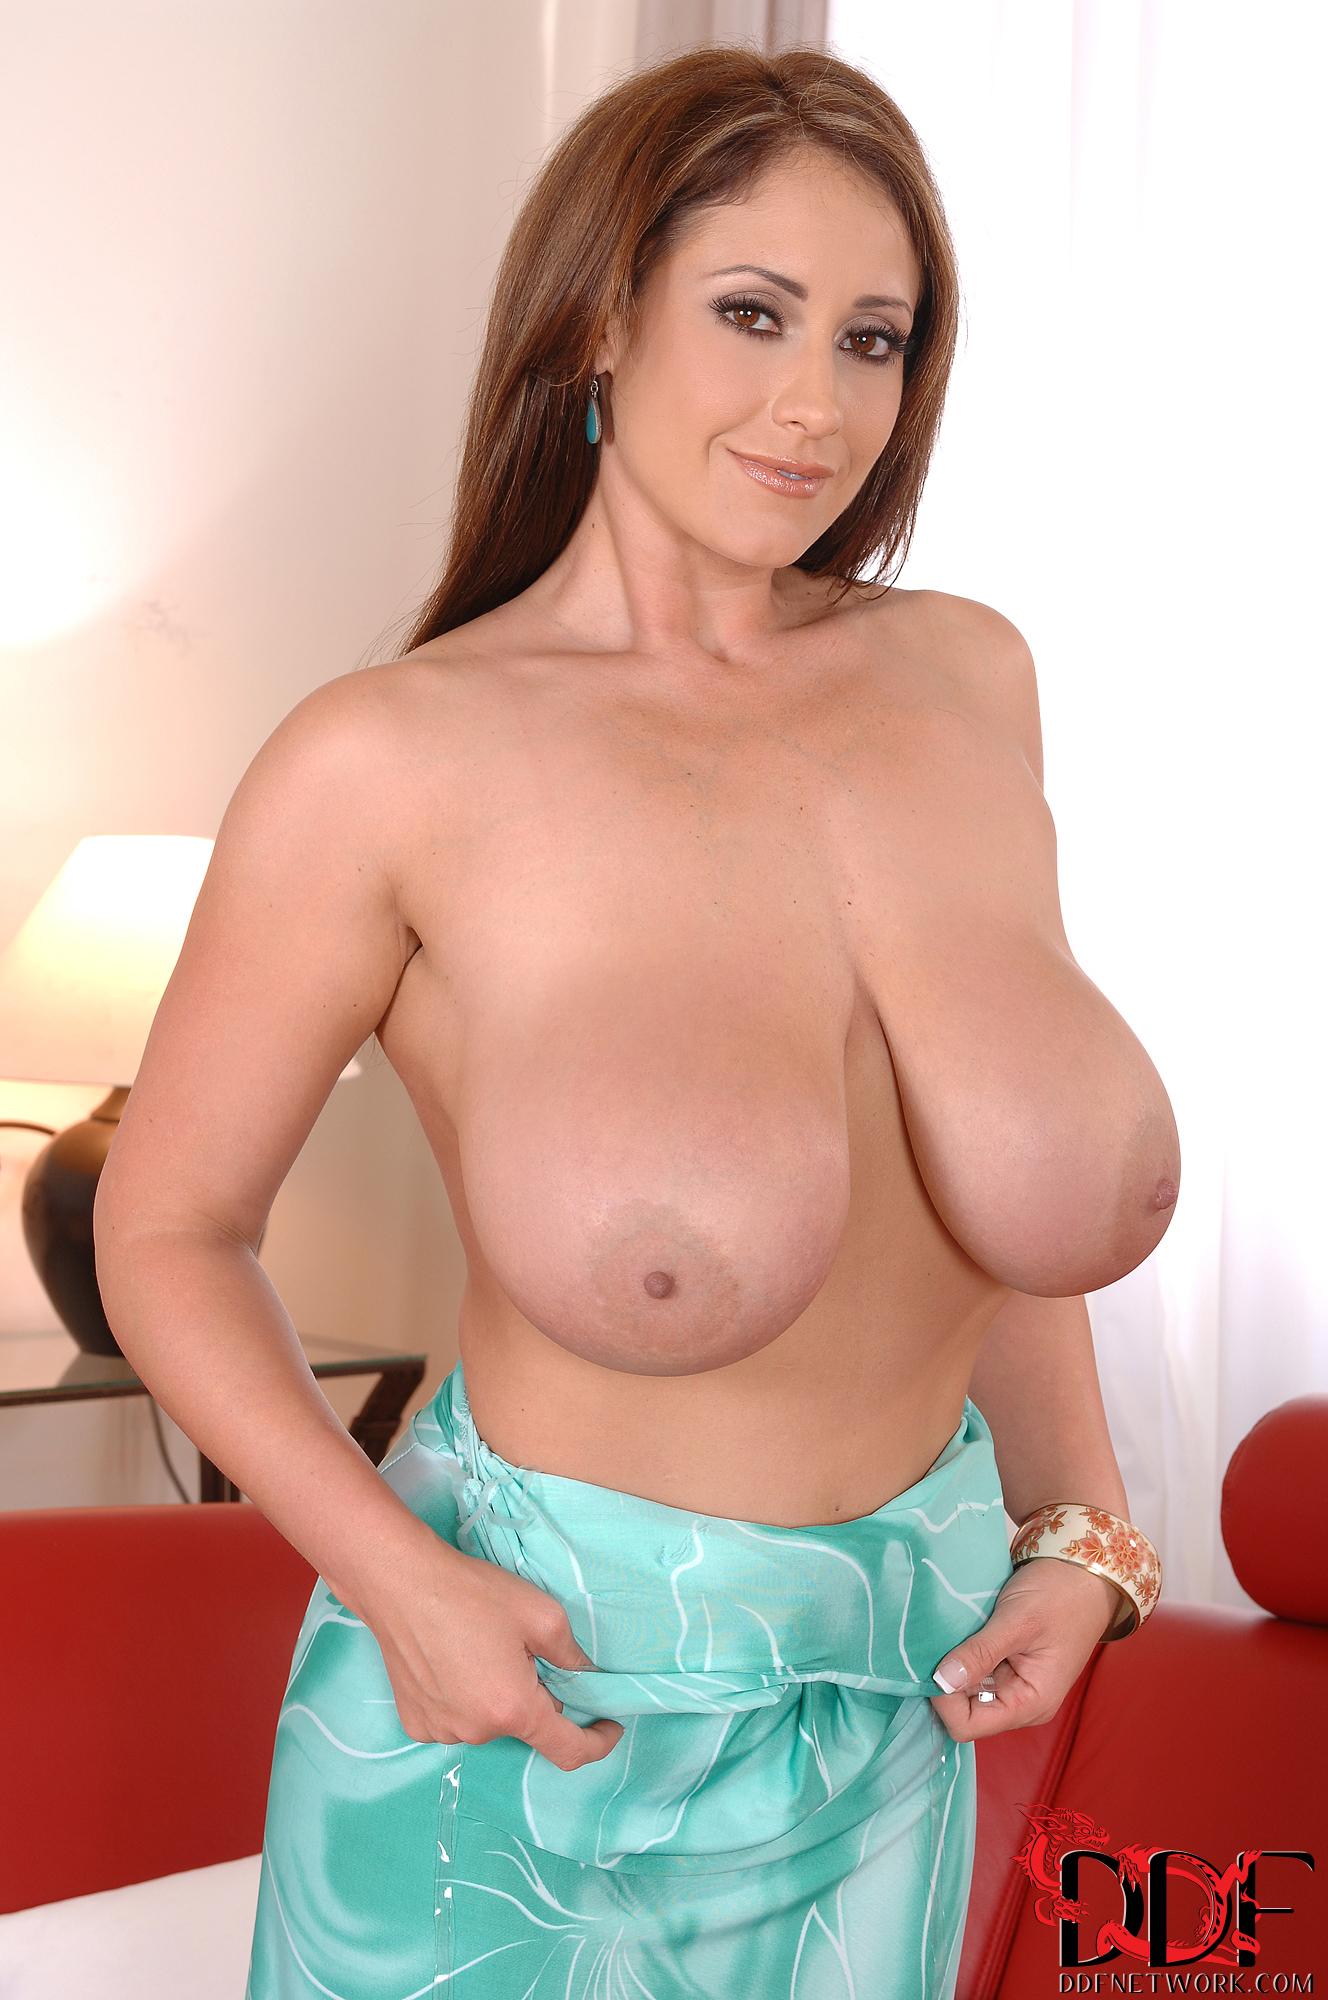 Naked Images Free nip slip boobies coochie upskirt